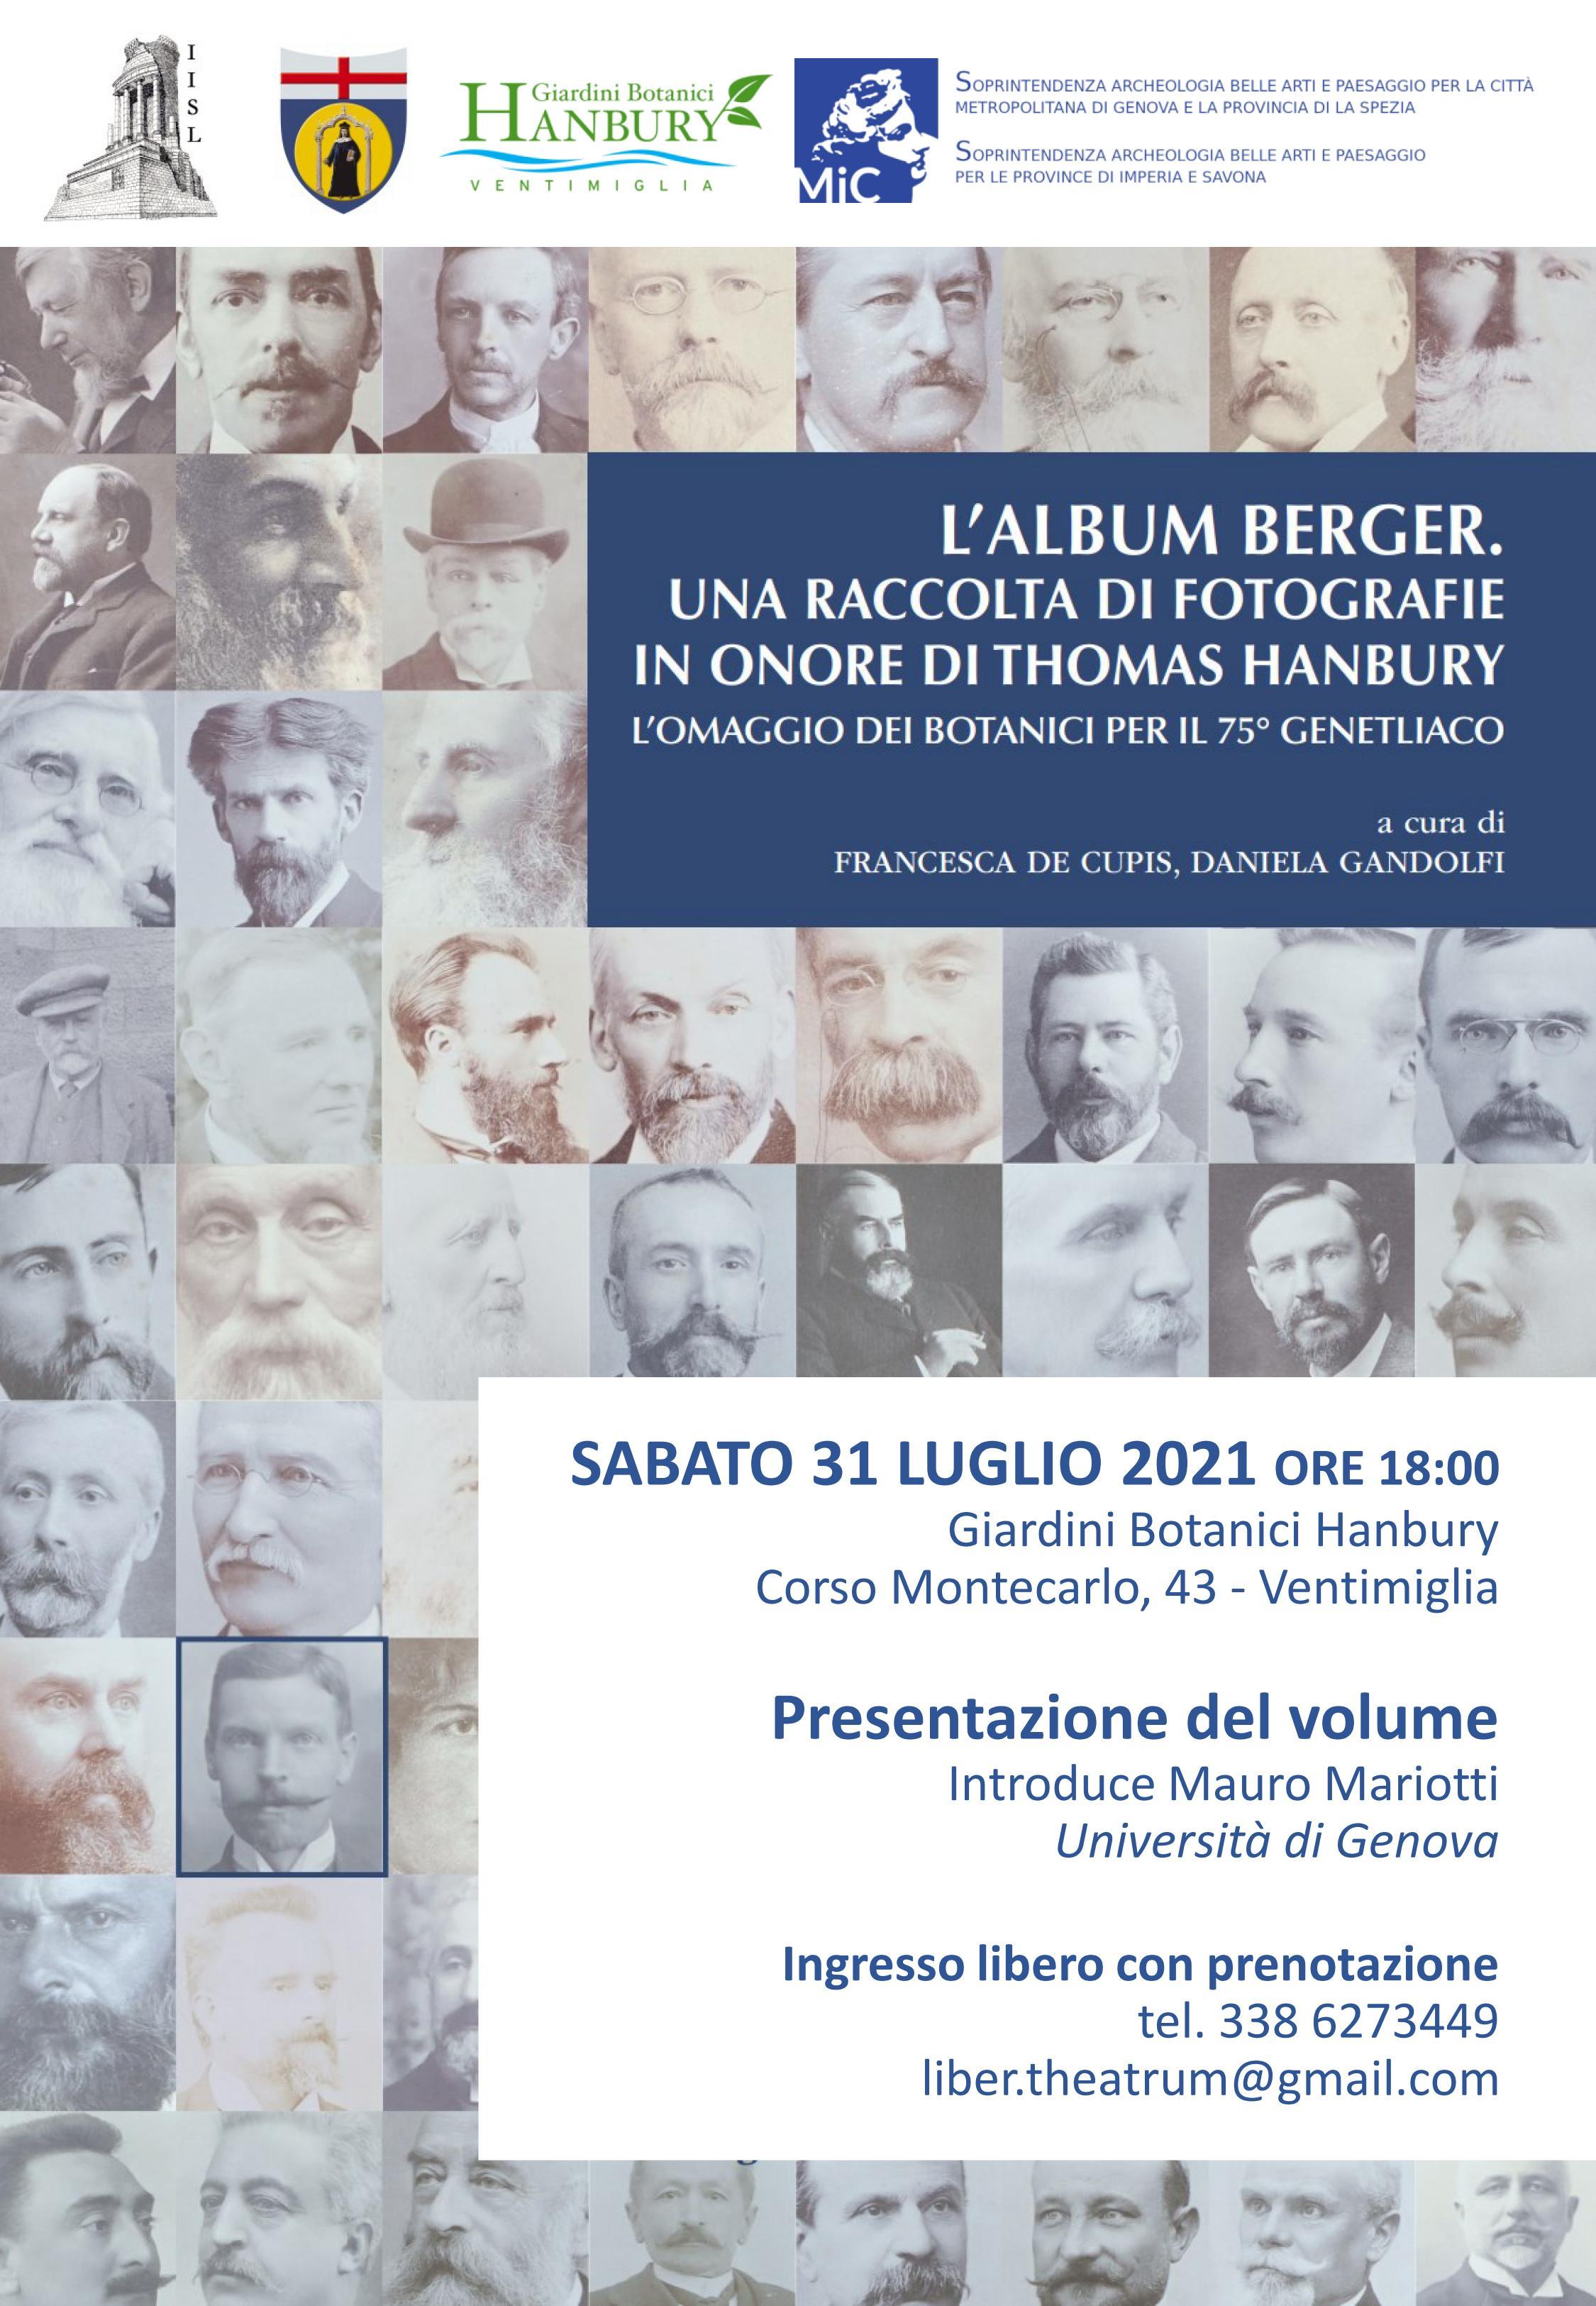 lalbum-berger-1